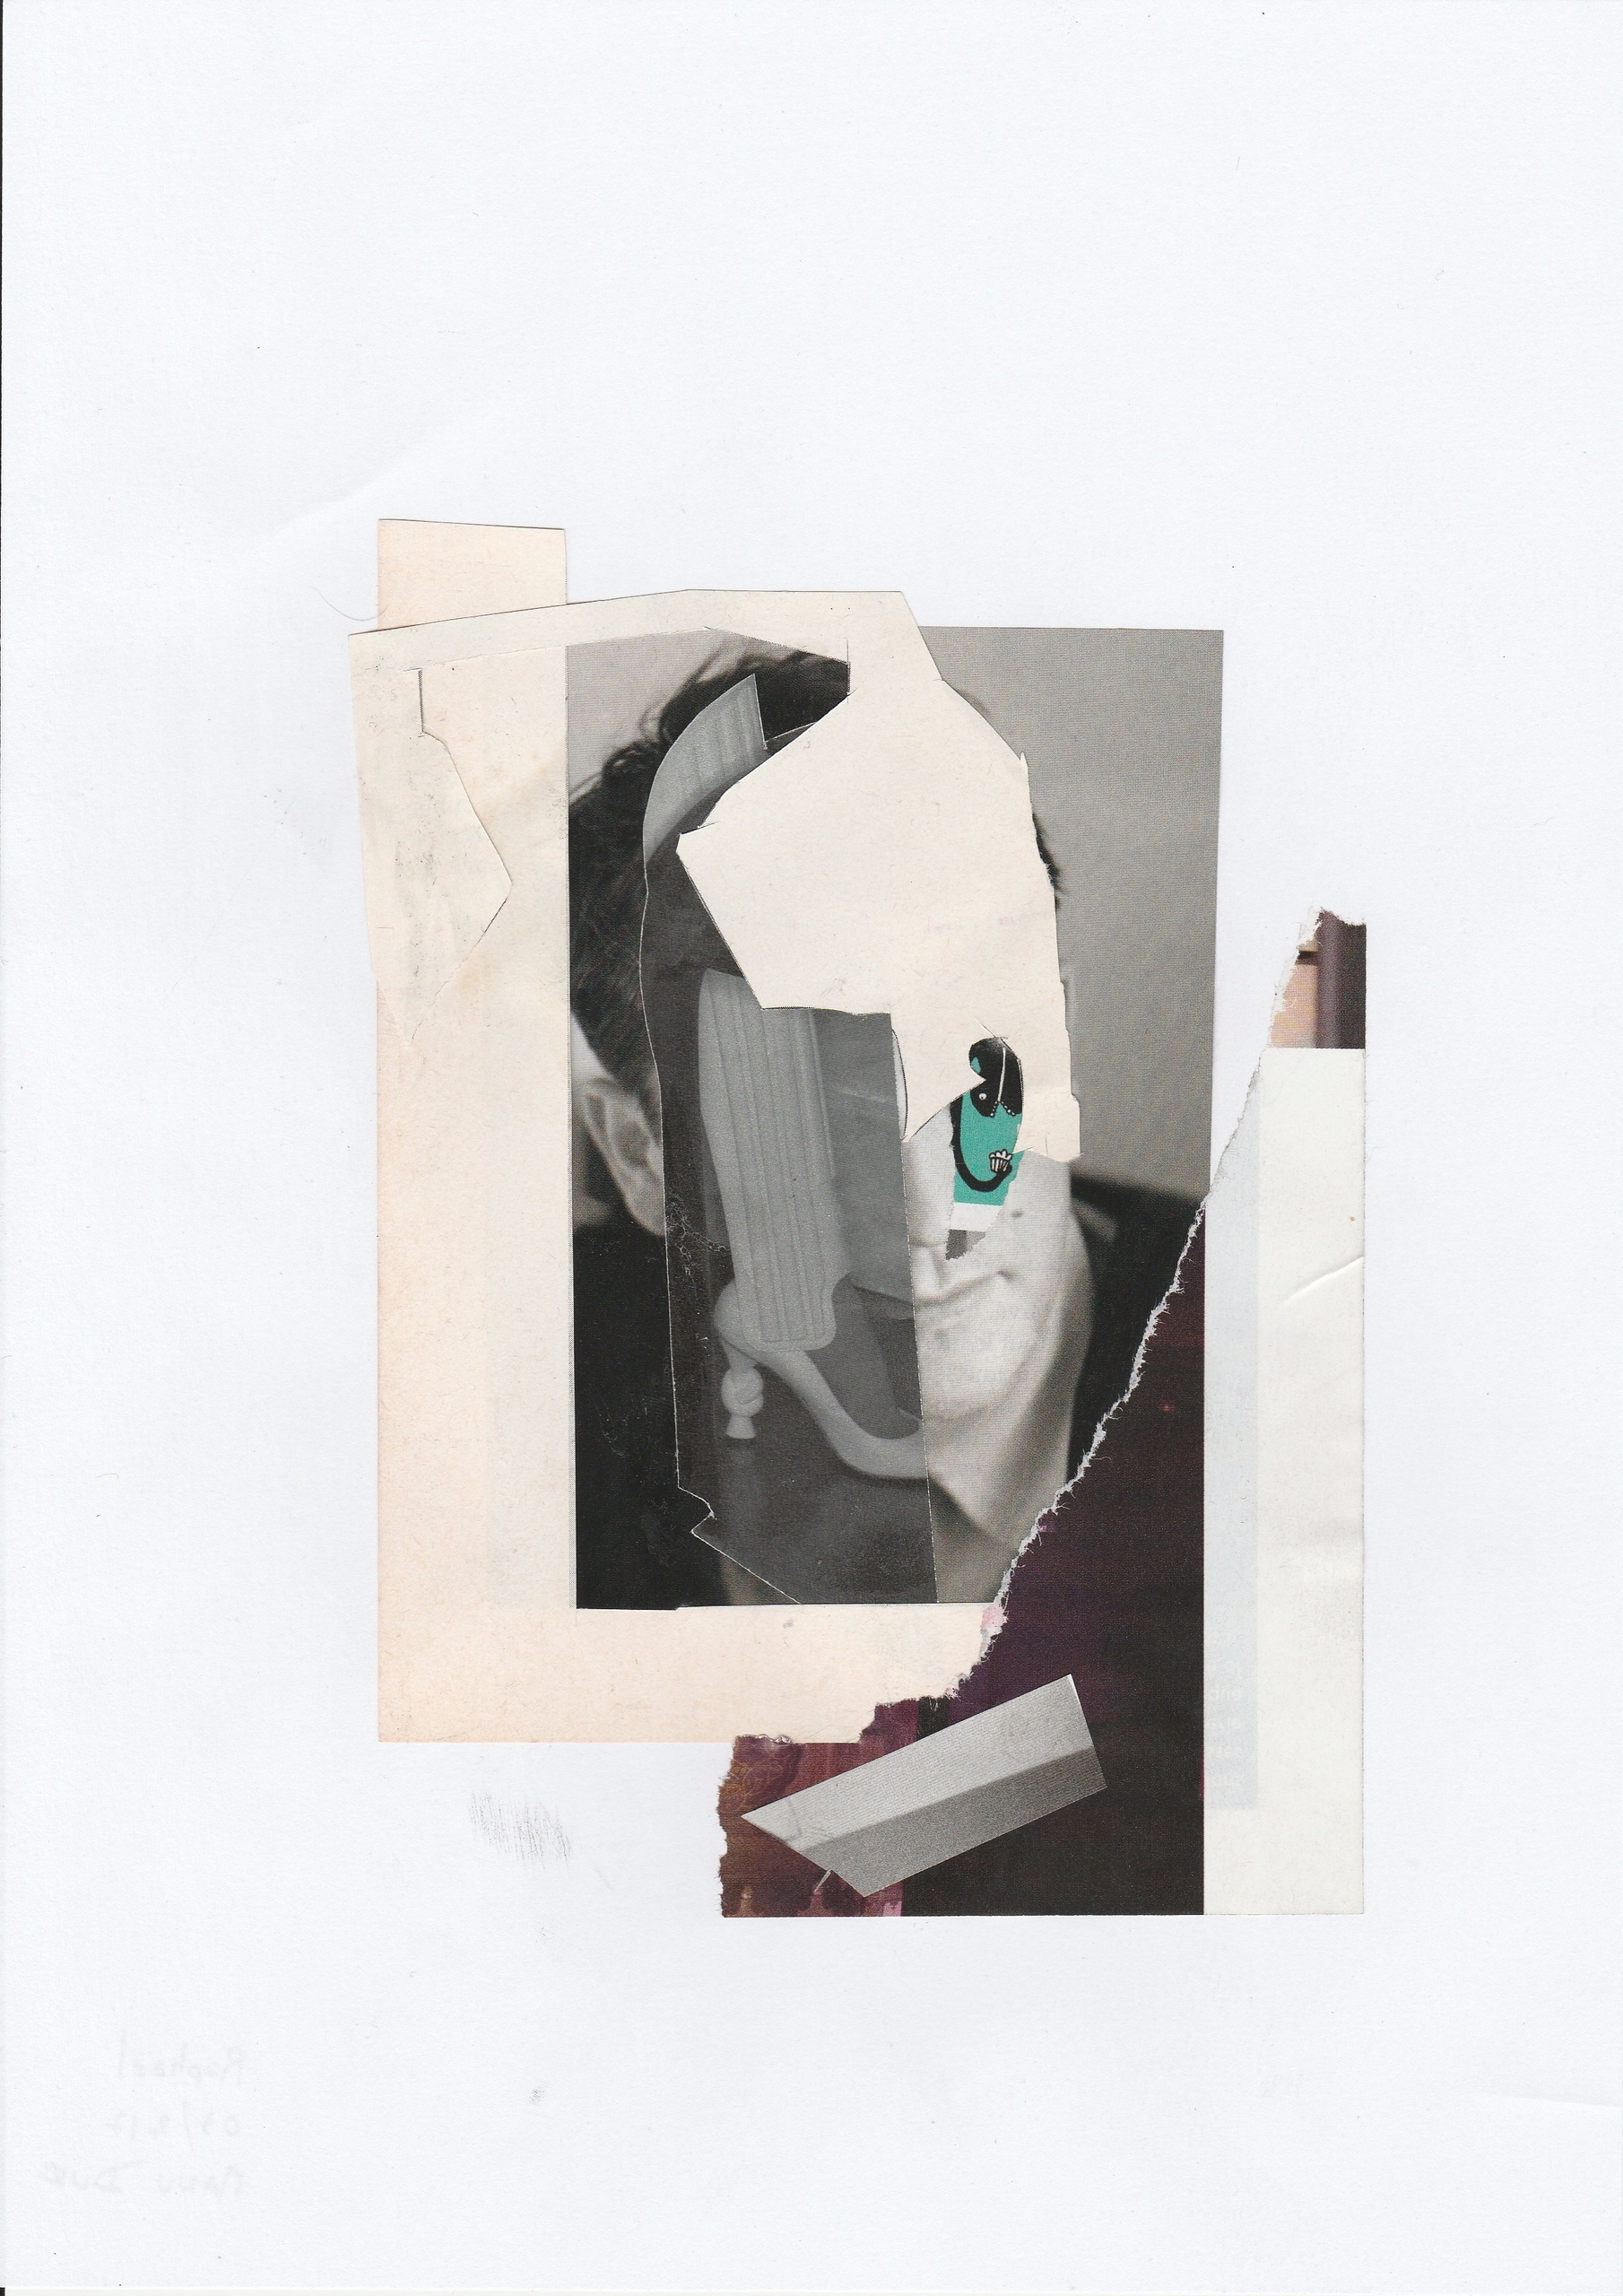 Raphaël - Handmade collage - portrait - manuduf | ello